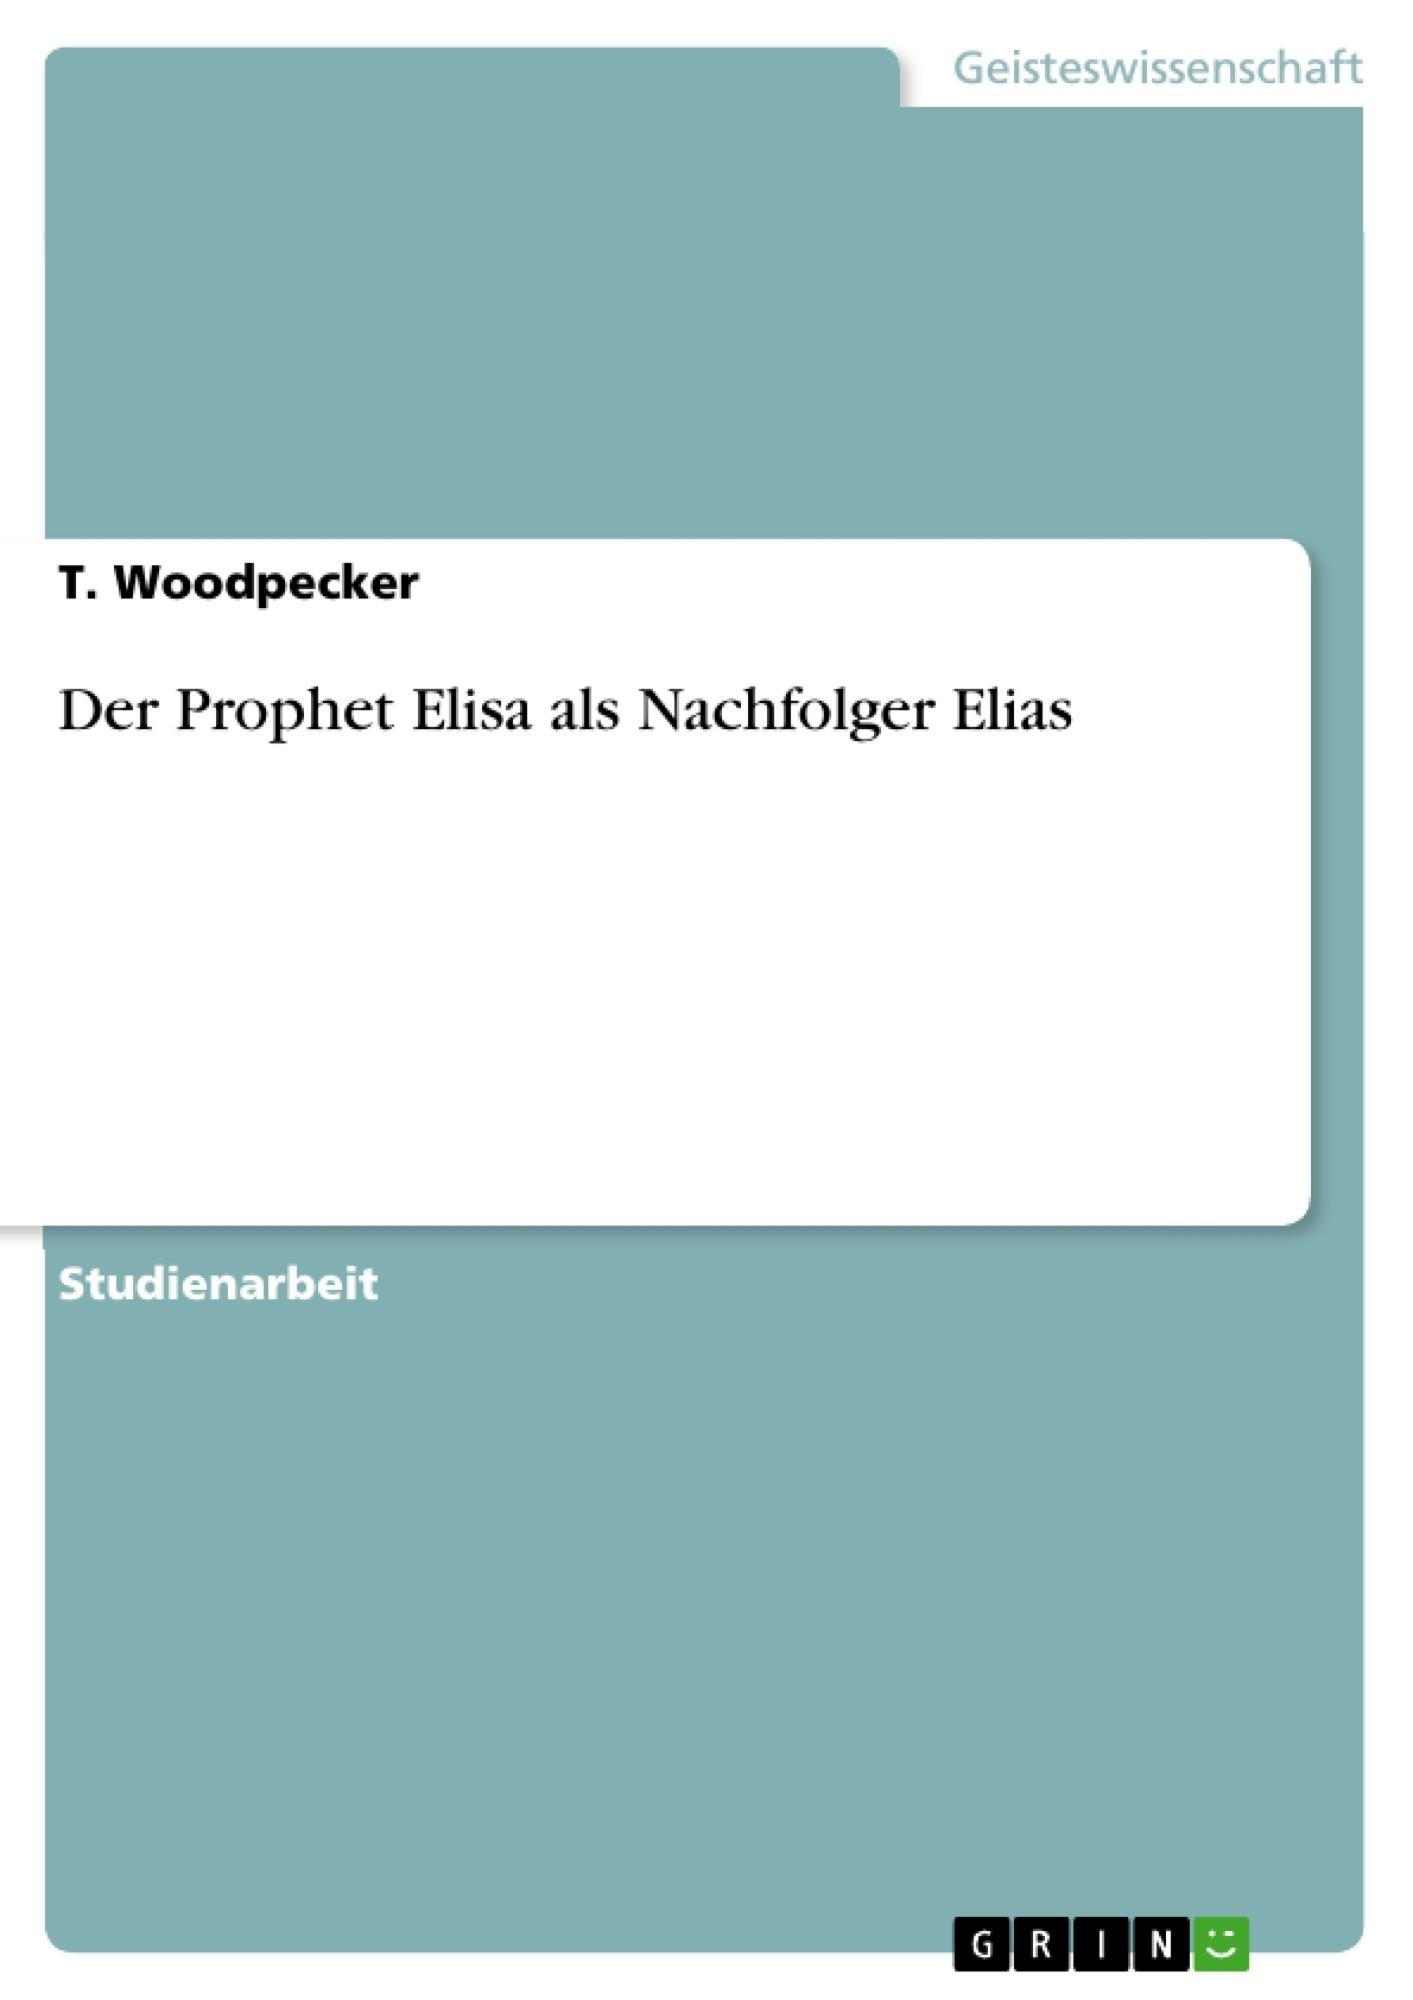 Titel: Der Prophet Elisa als Nachfolger Elias